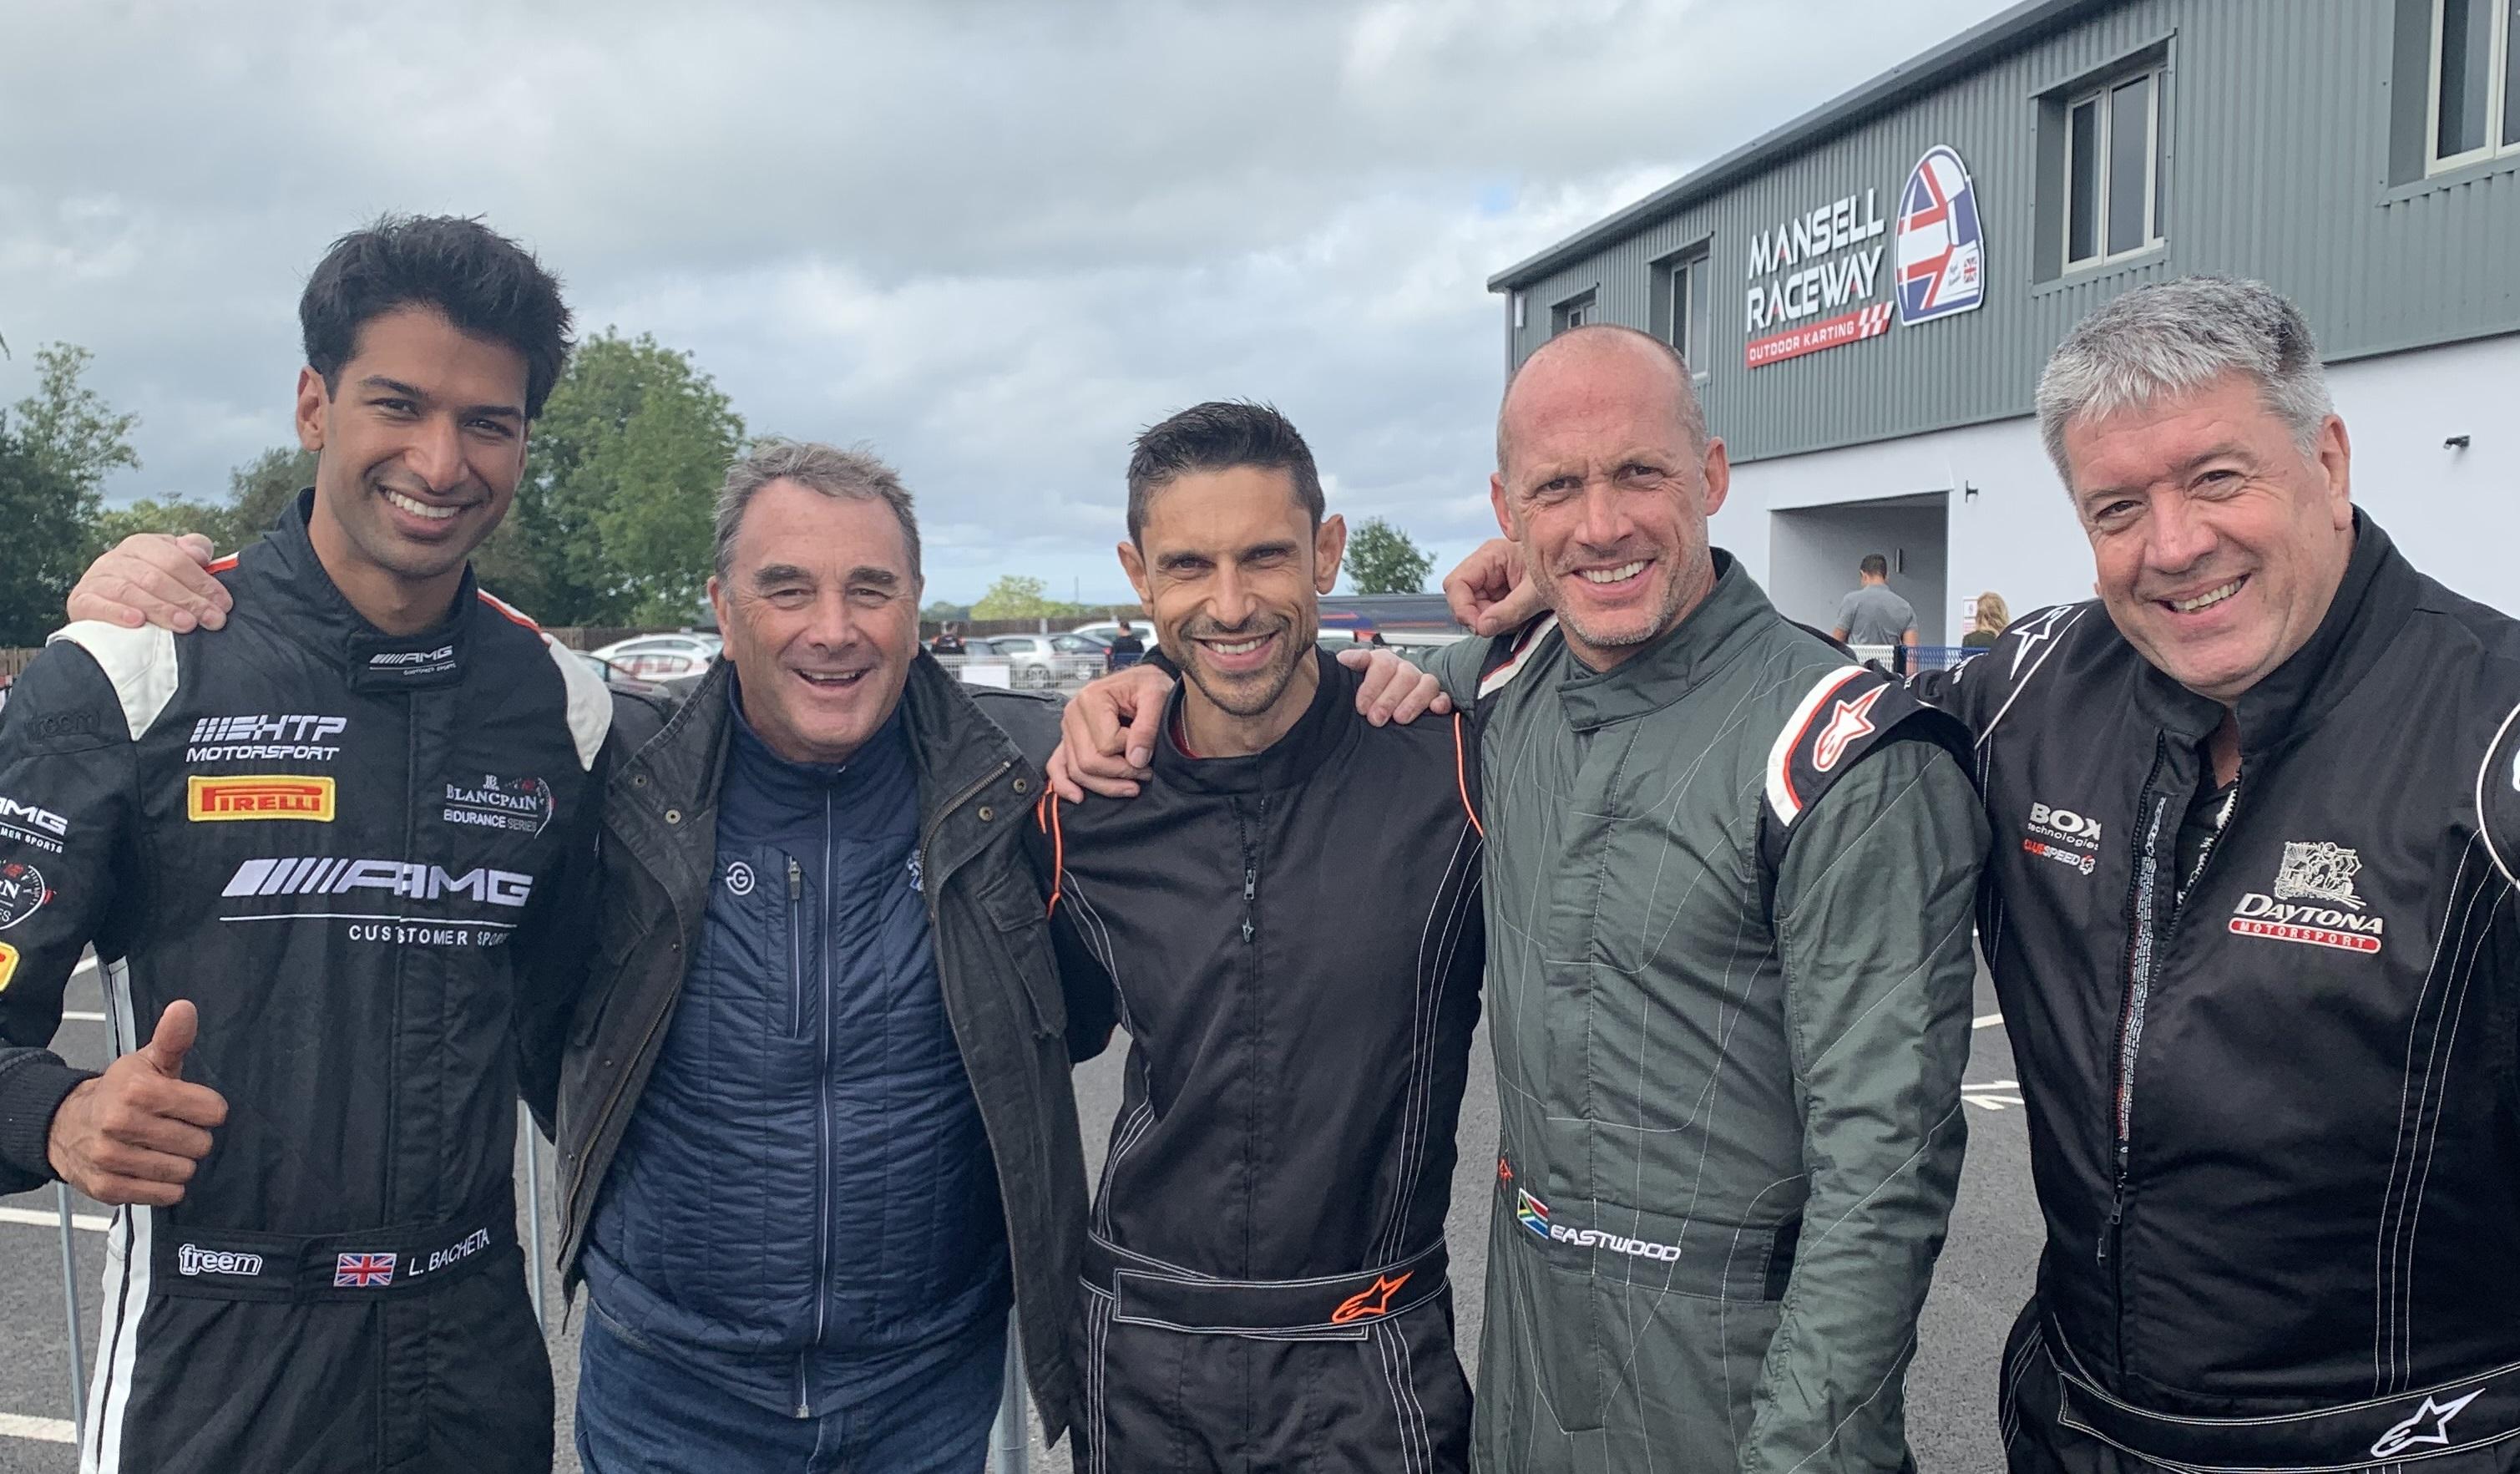 Daytona MOTORSPORT wins NIGEL Mansell Charity Race